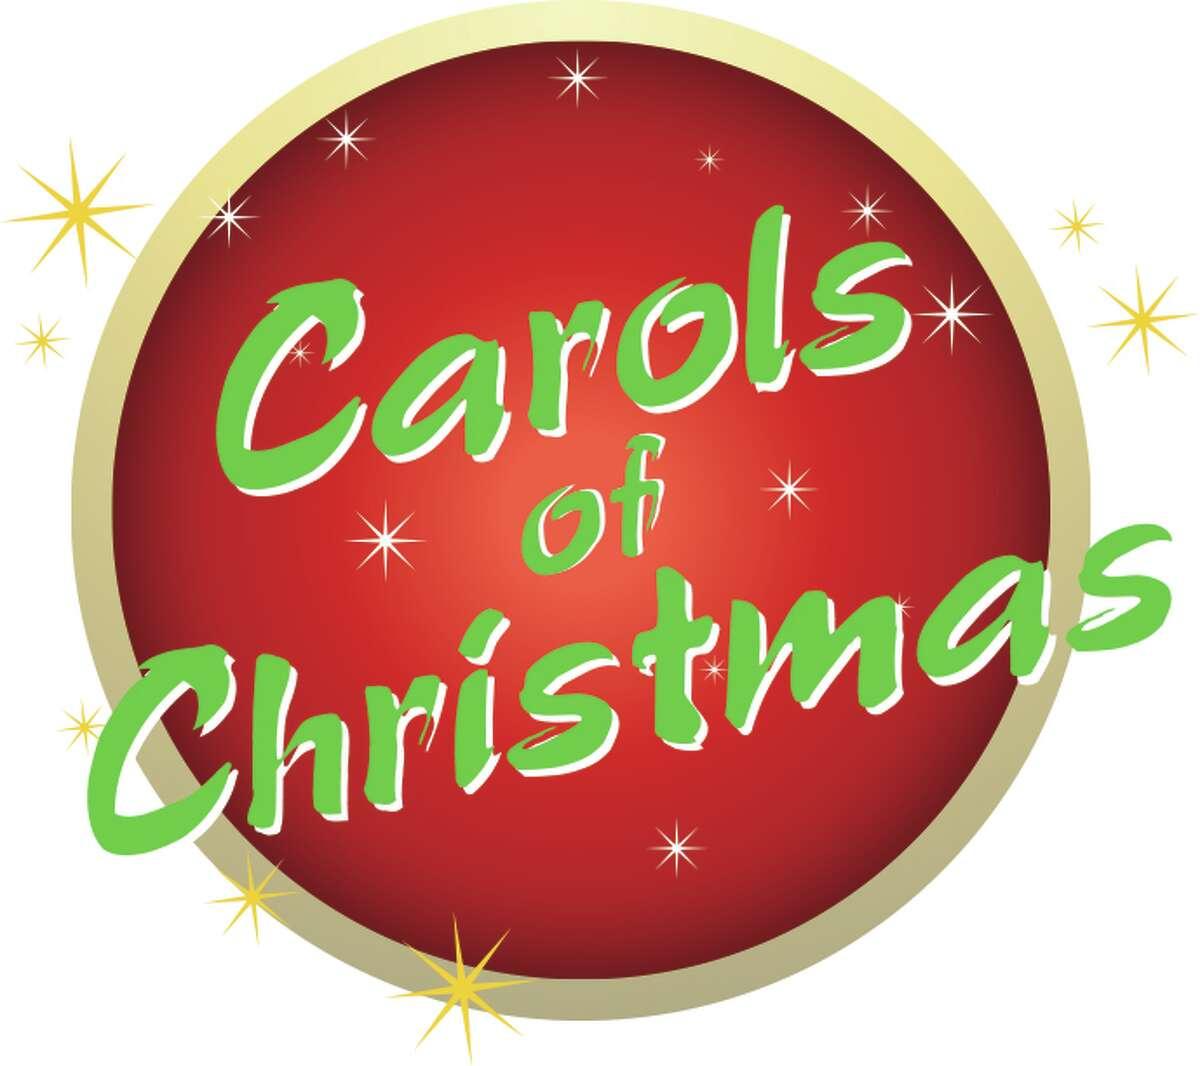 Manistee's Carols of Christmas.